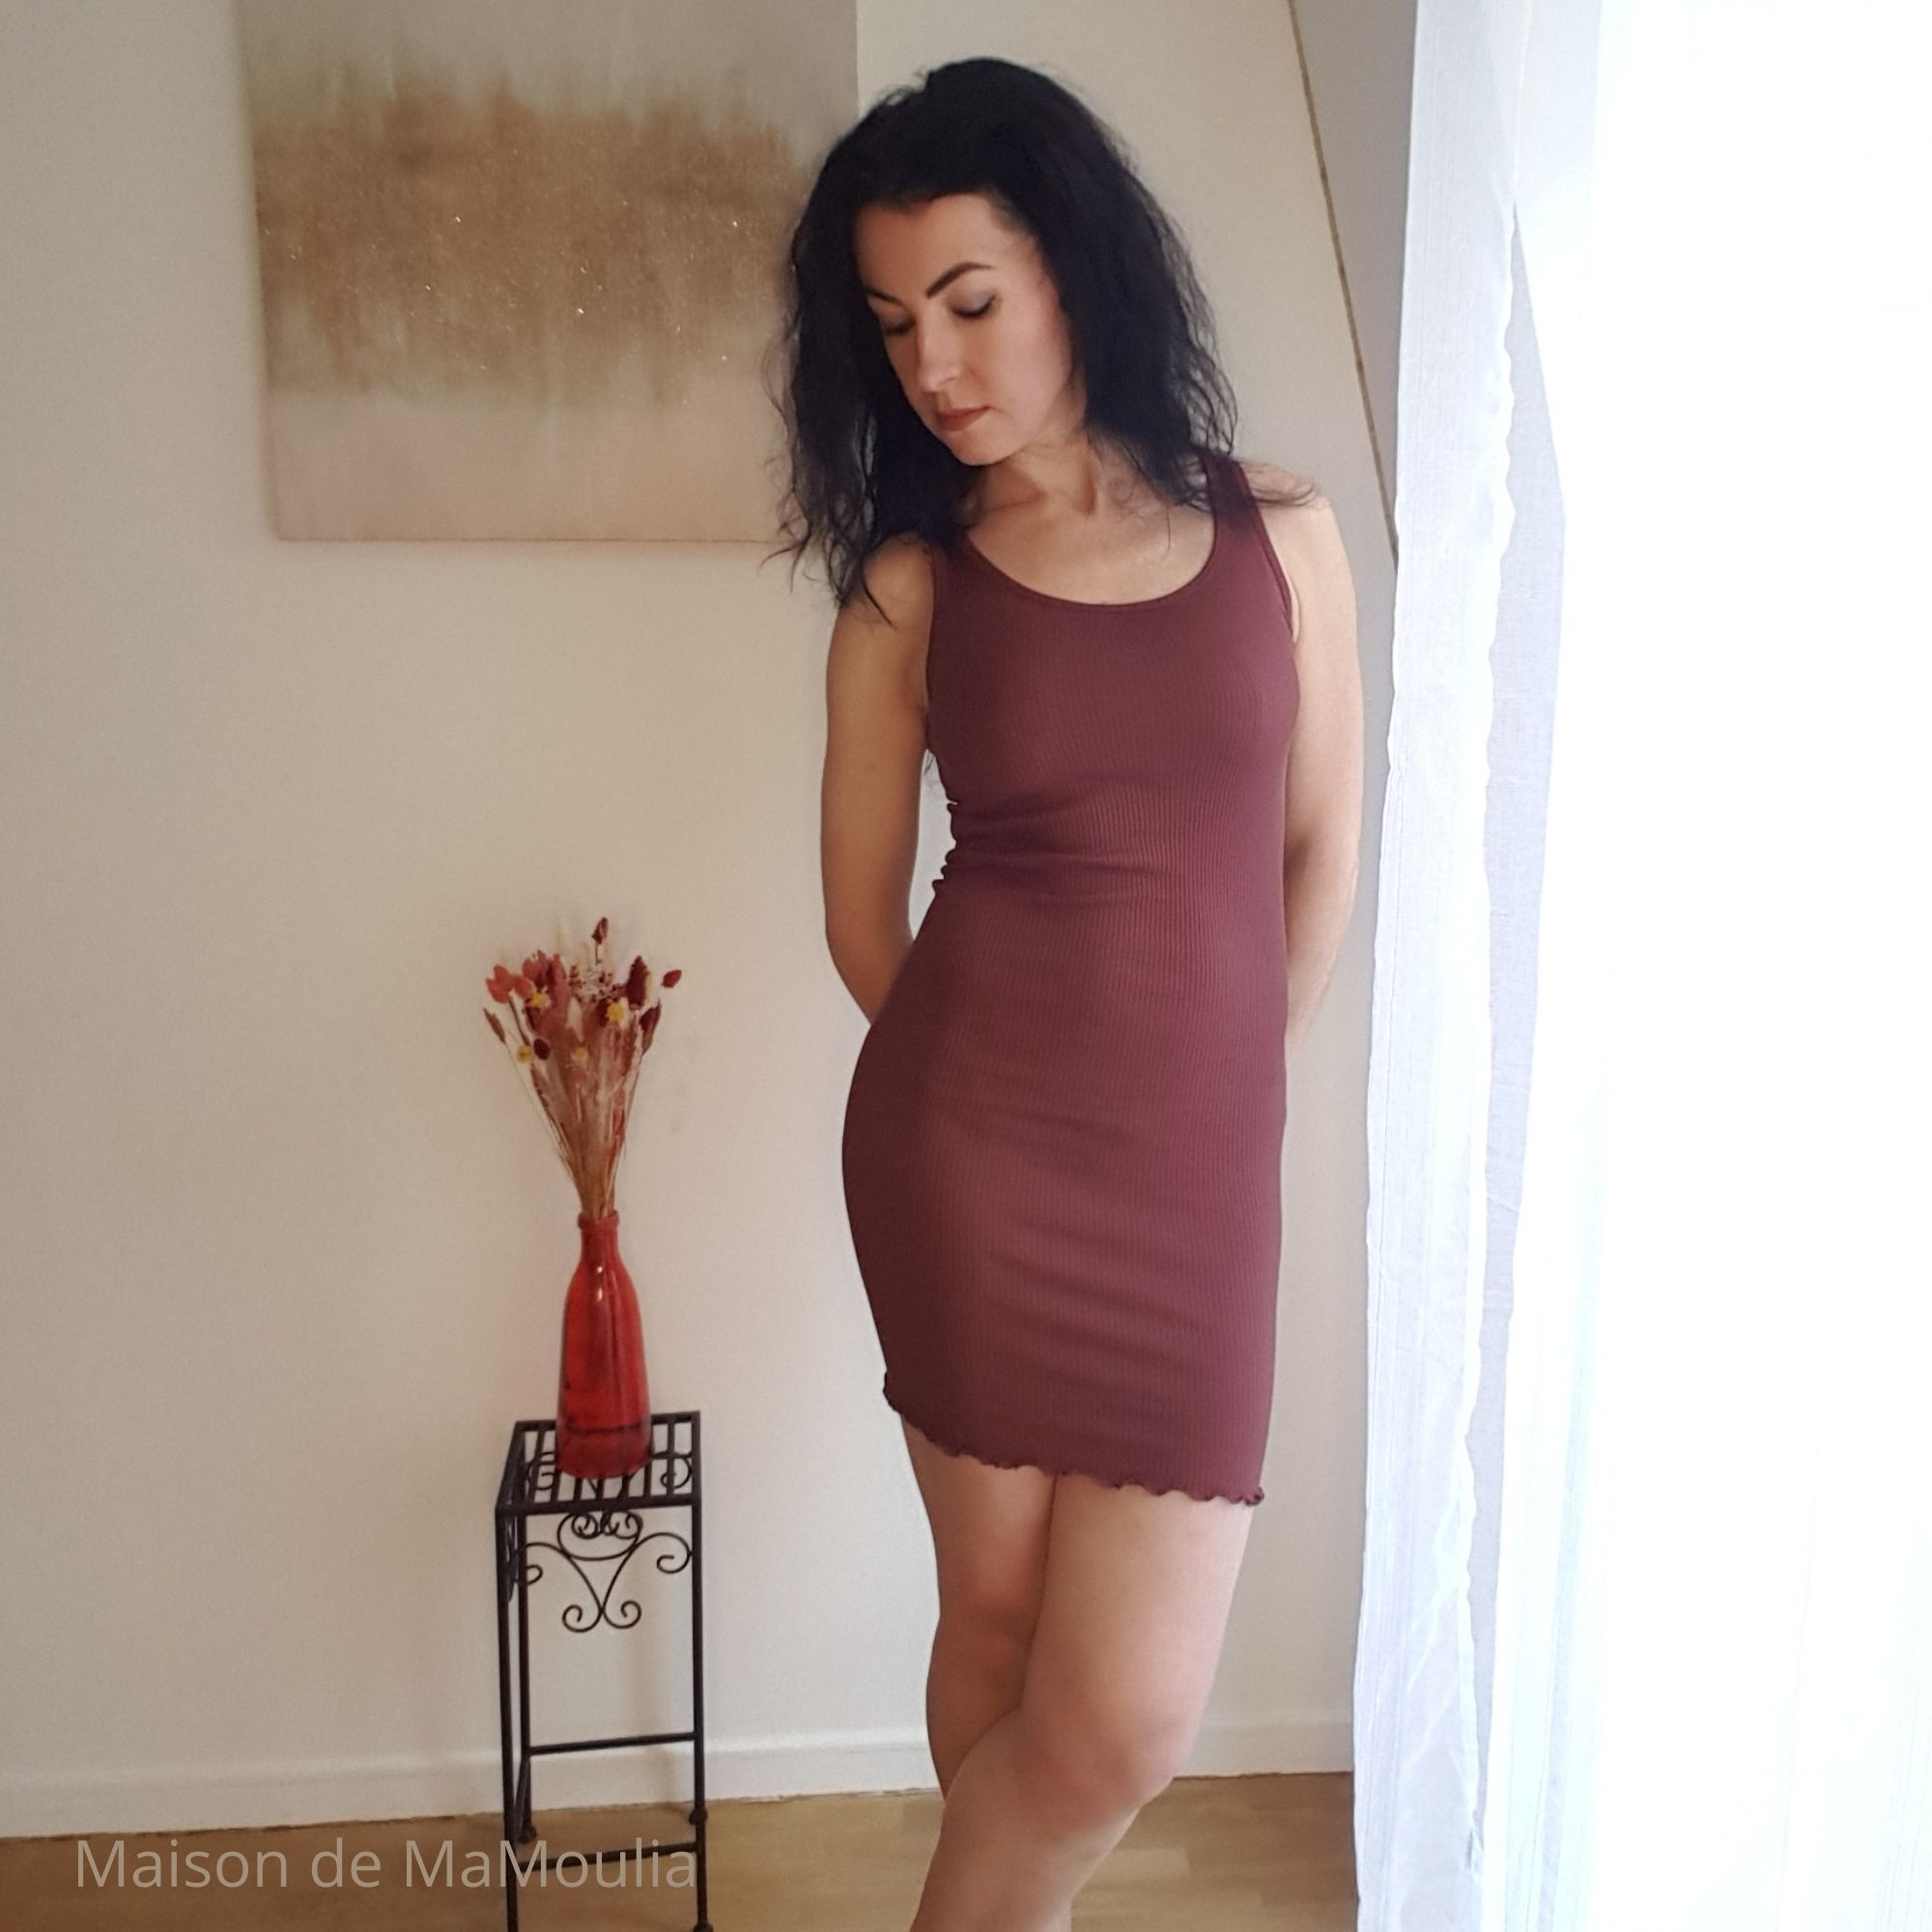 MINIMALISMA - Robe ou débardeur pour femme - Soie 70% / coton 30% - Gry - Mahogany